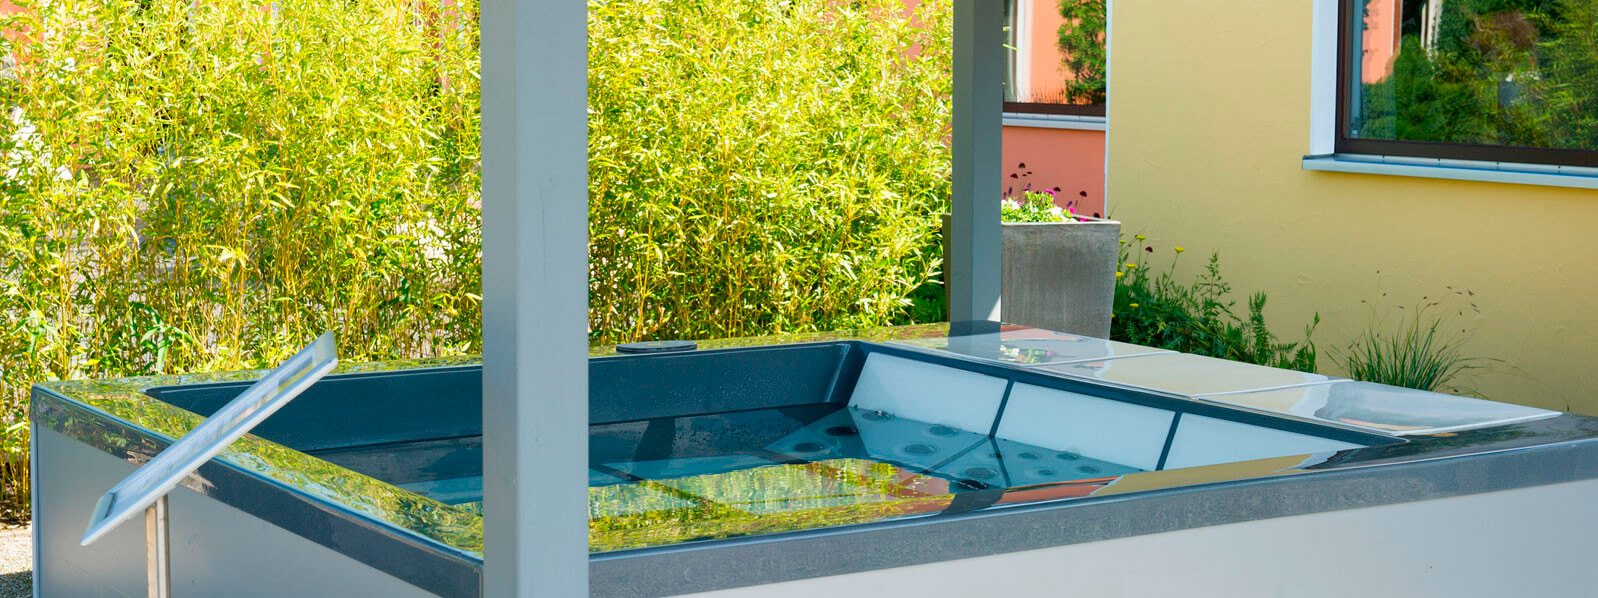 Ausstellungswhirlpool Lounge Concept in Senden-Bösensell